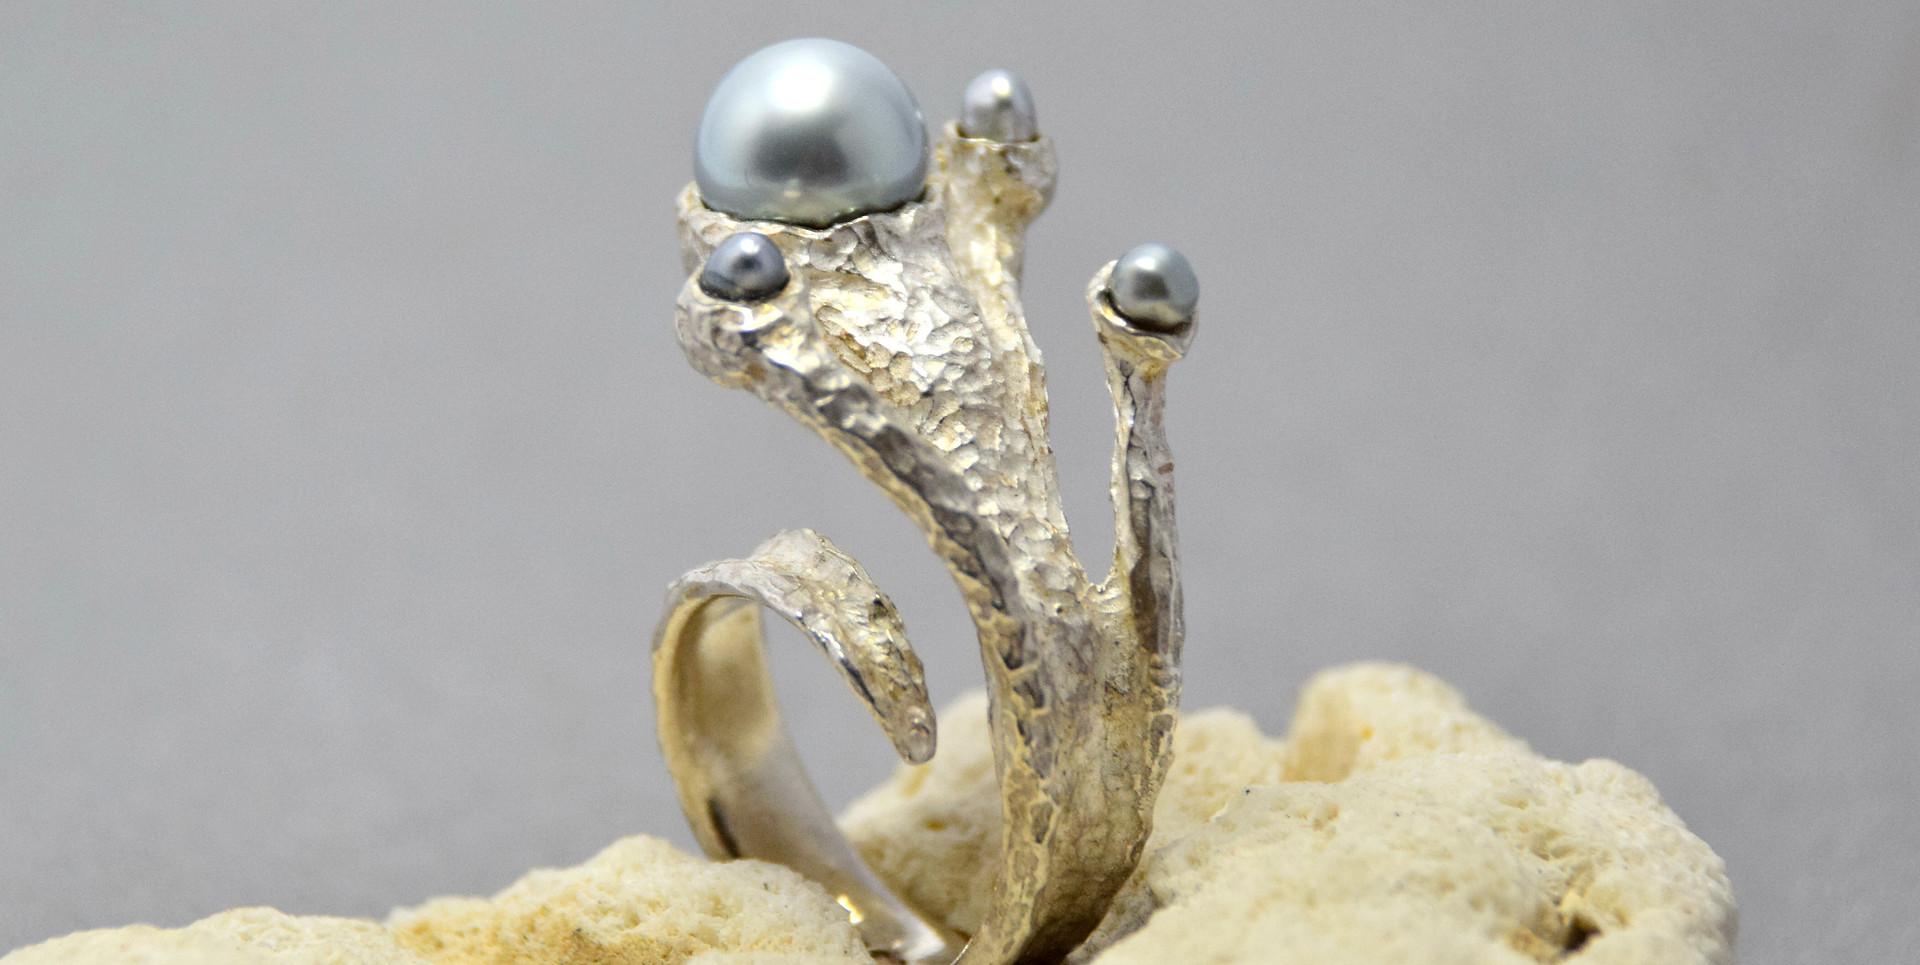 sealife metallic silver/blue